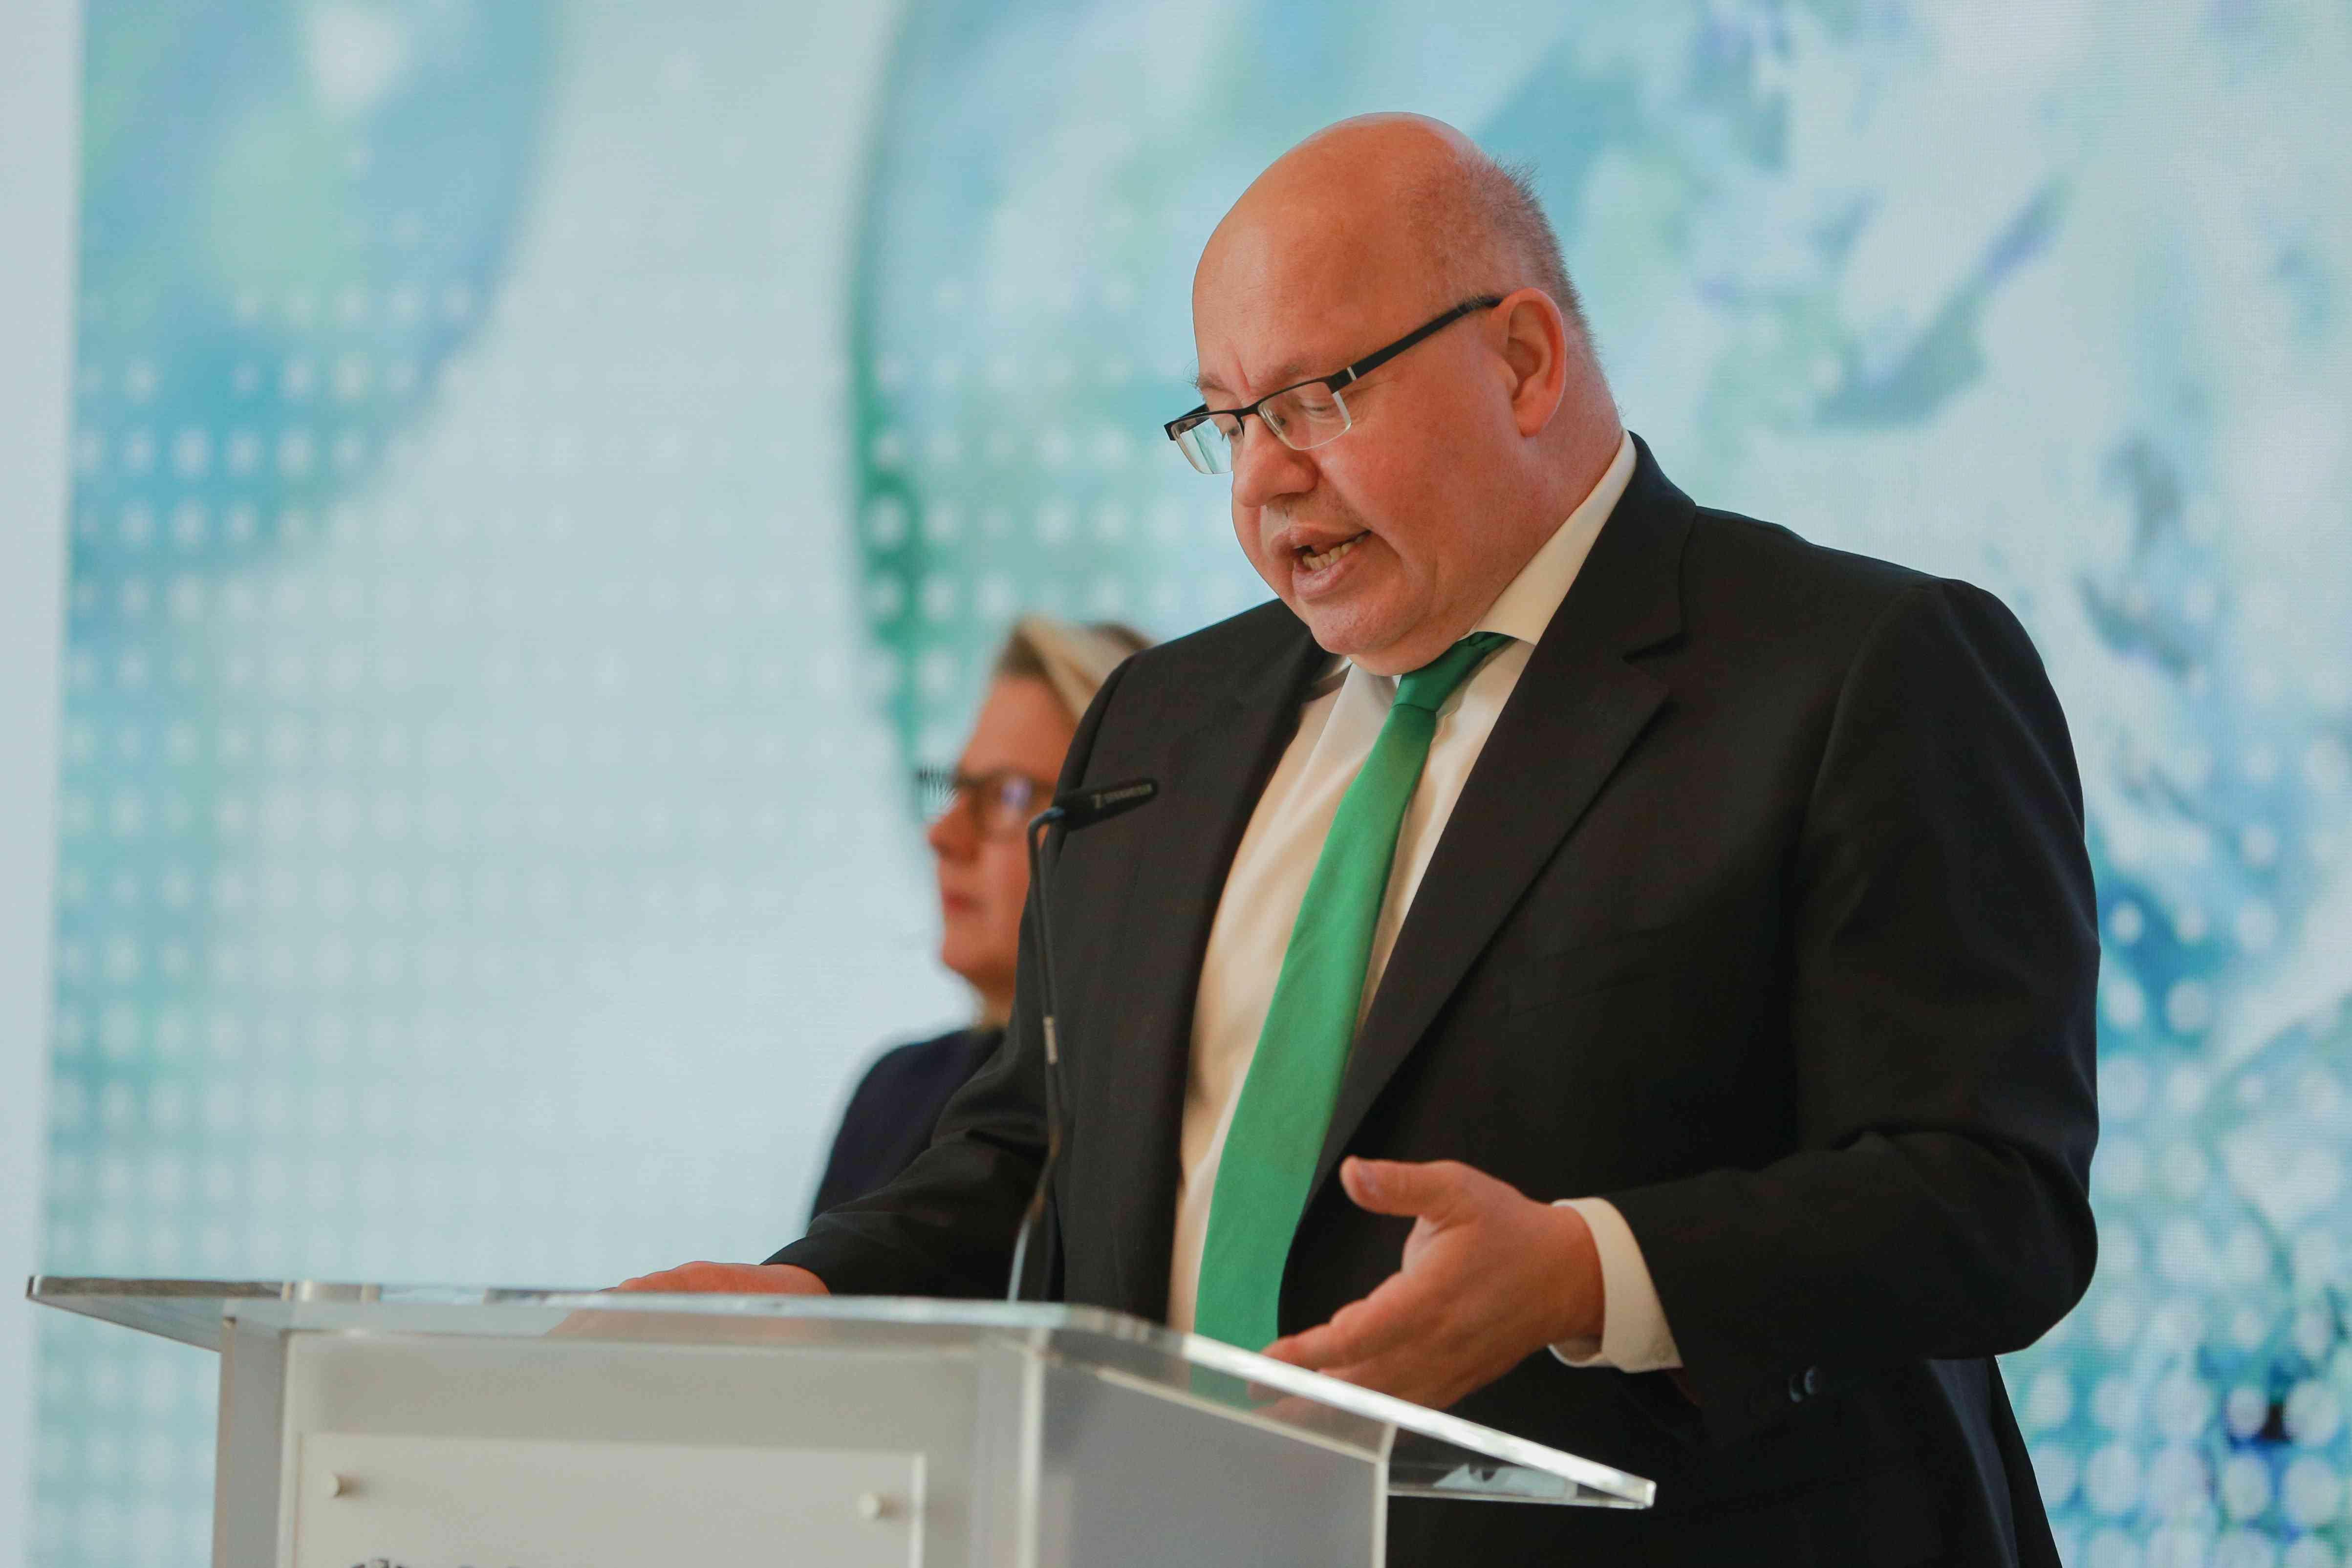 erman Economy Minister Peter Altmaier